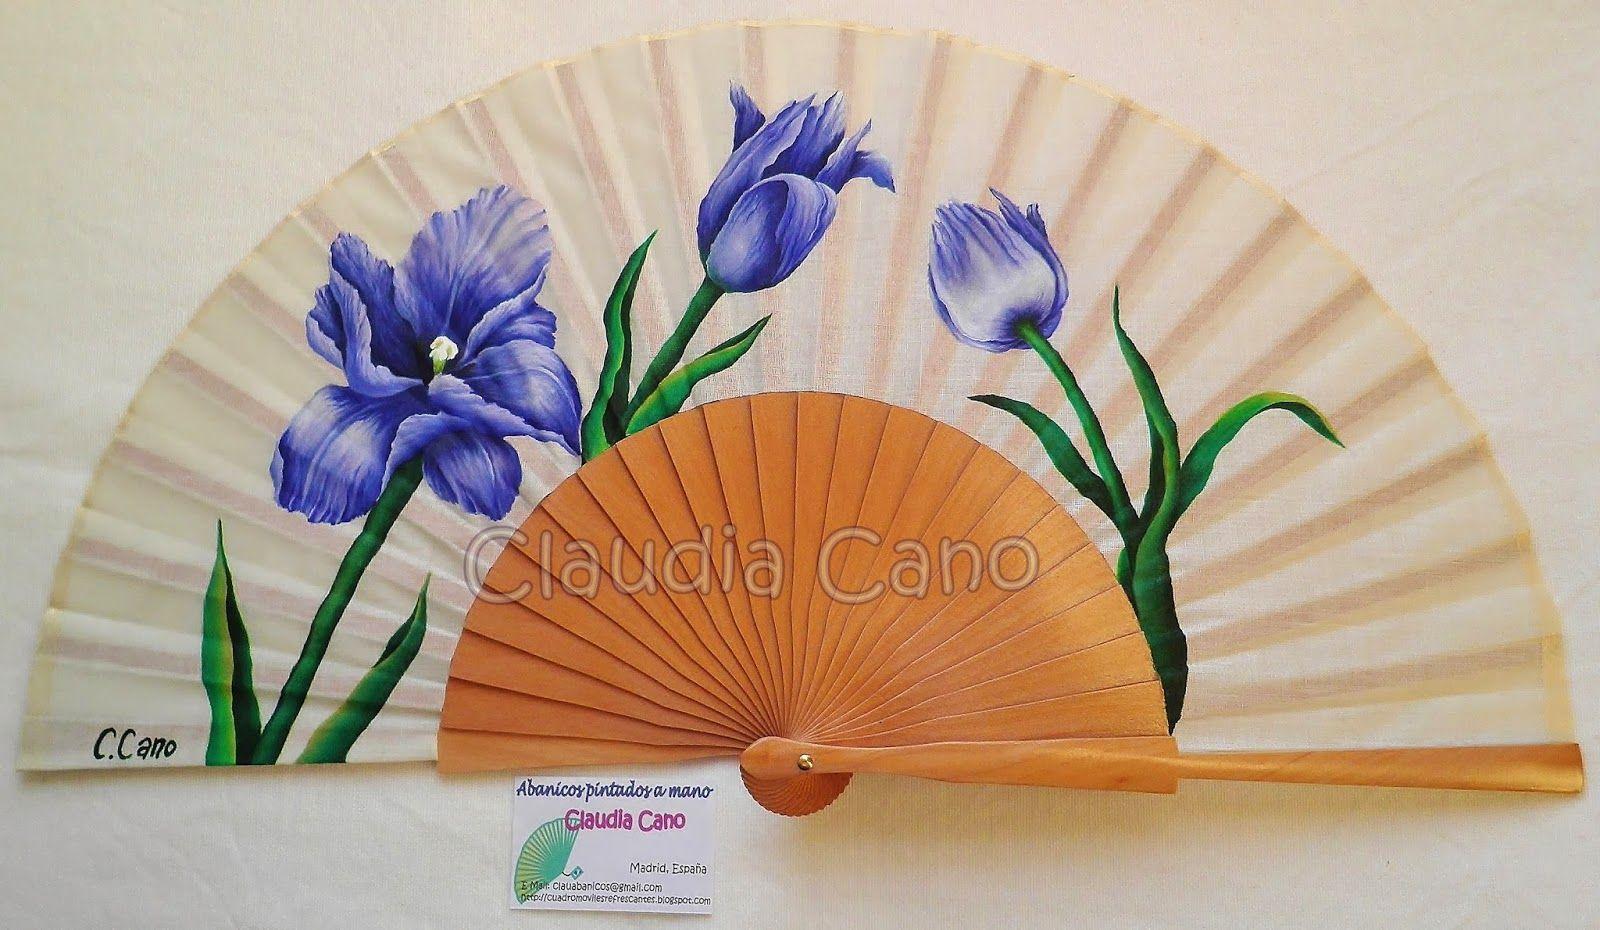 Abanicos pintados a mano por claudia cano tulipanes - Como pintar abanicos ...